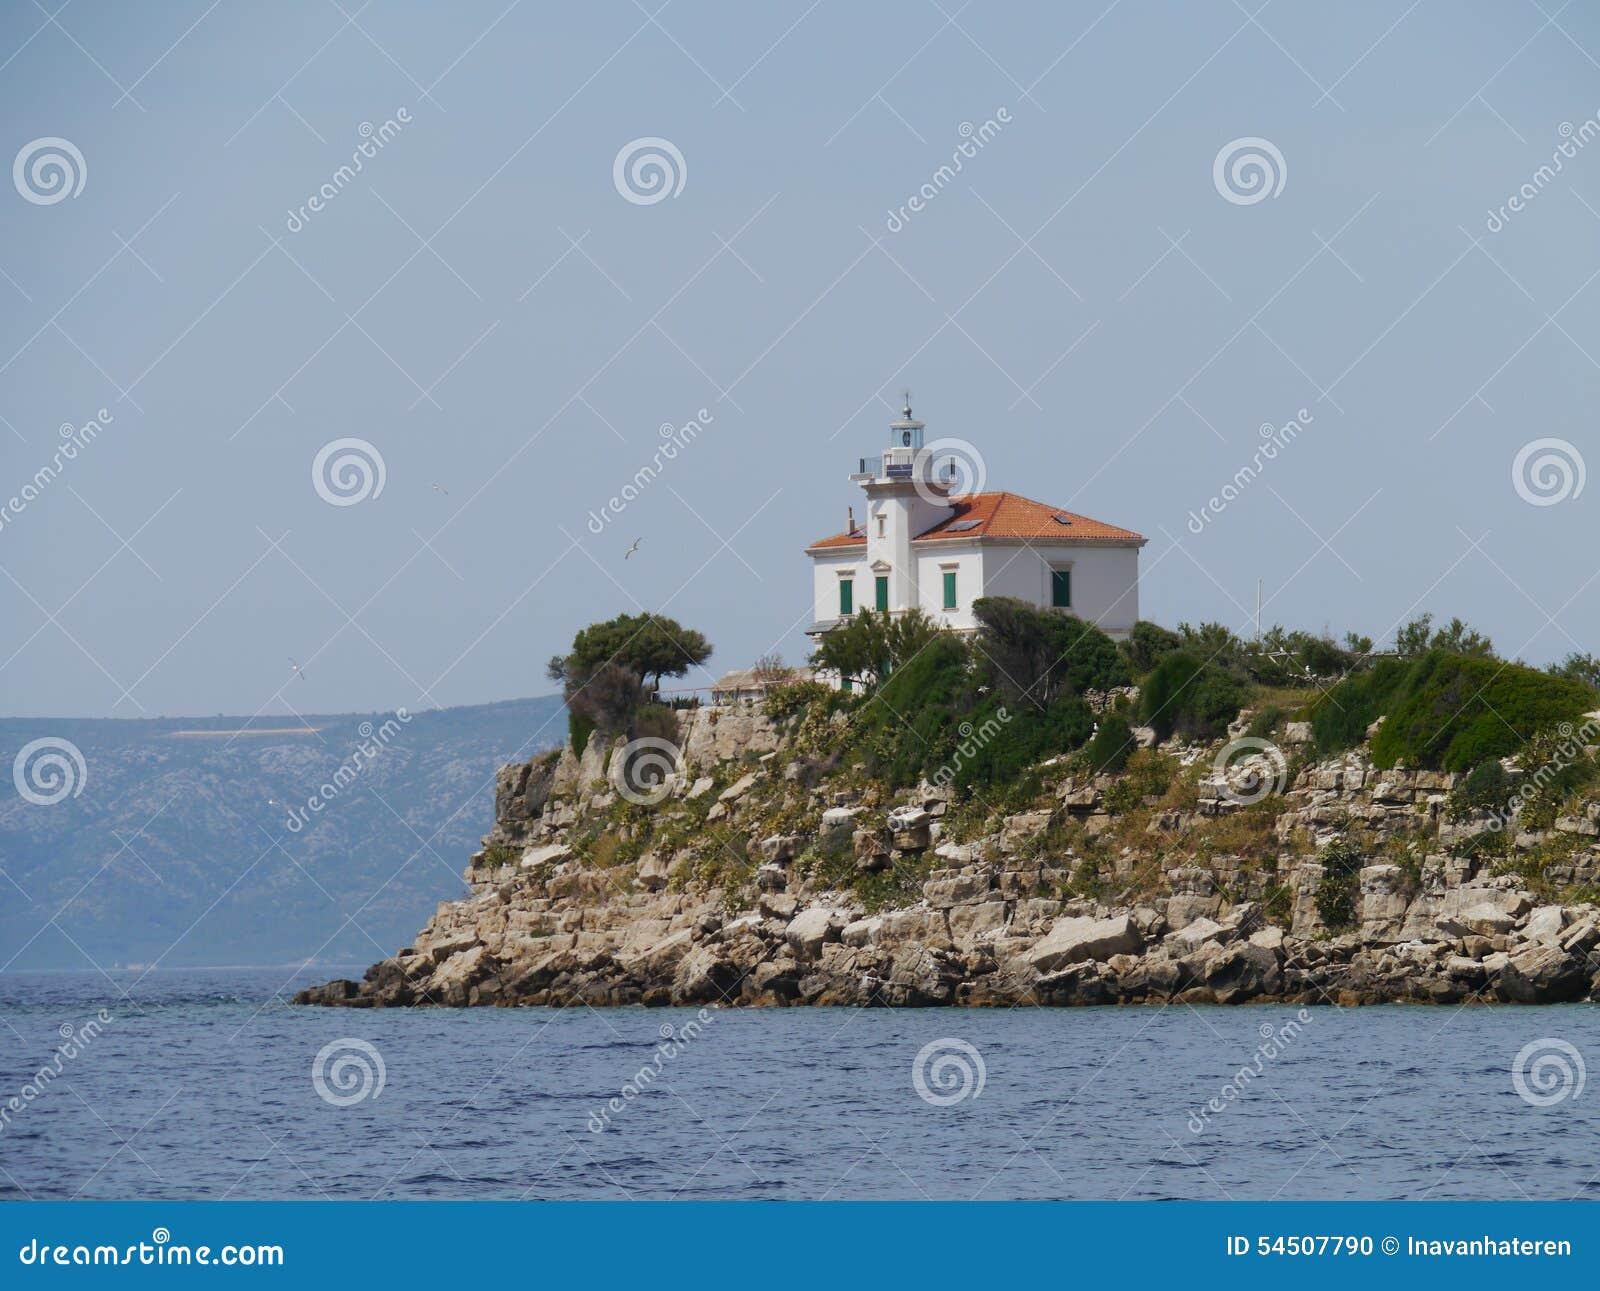 Le phare de Plocica en Mer Adriatique de la Croatie